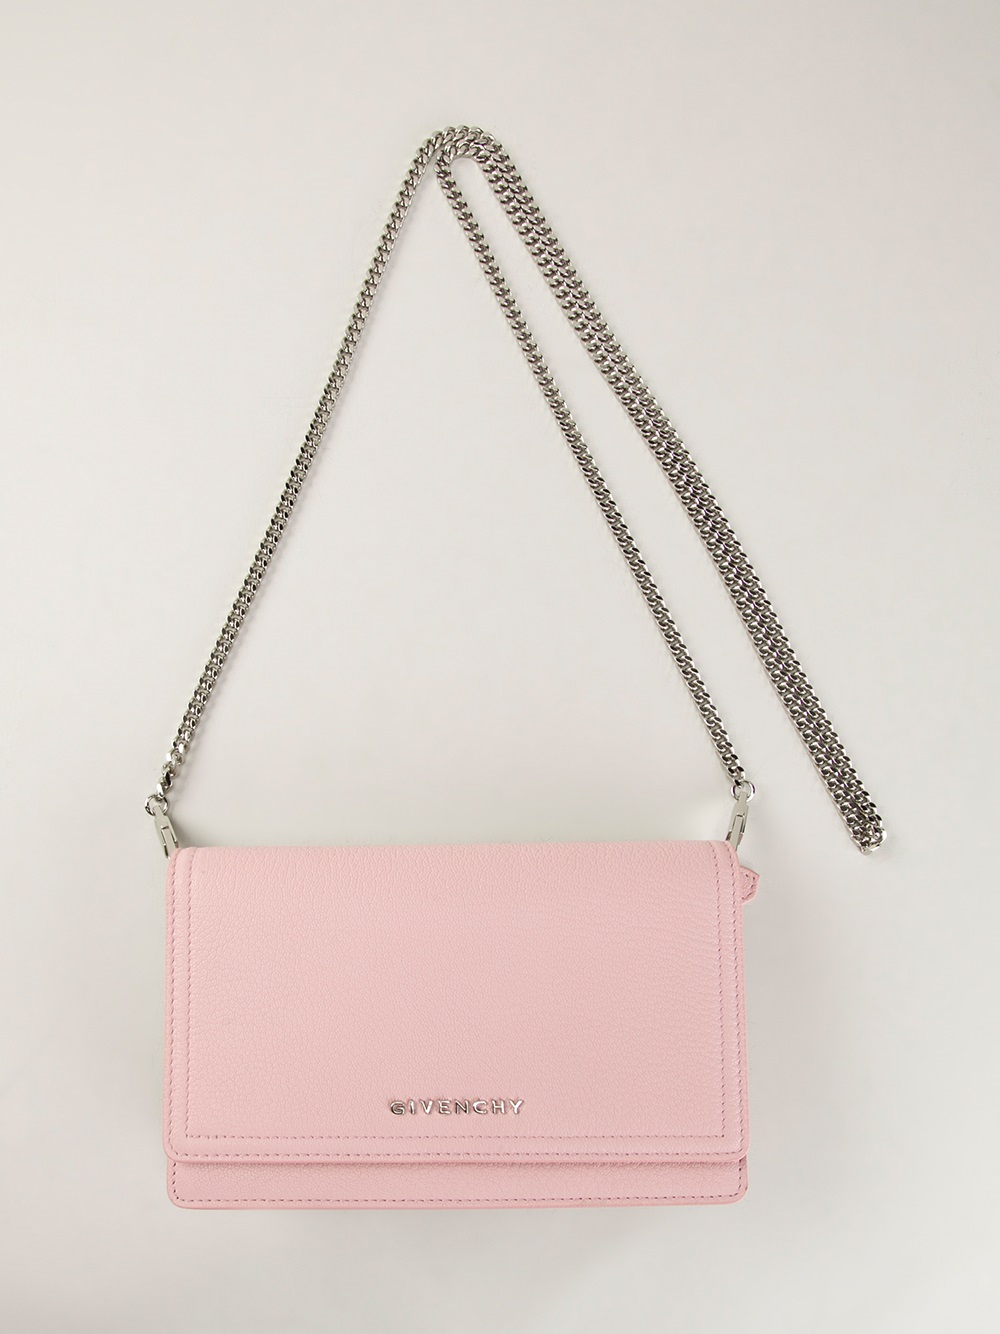 Lyst - Givenchy Pandora Mini Shoulder Bag in Pink 8ff406afb8348